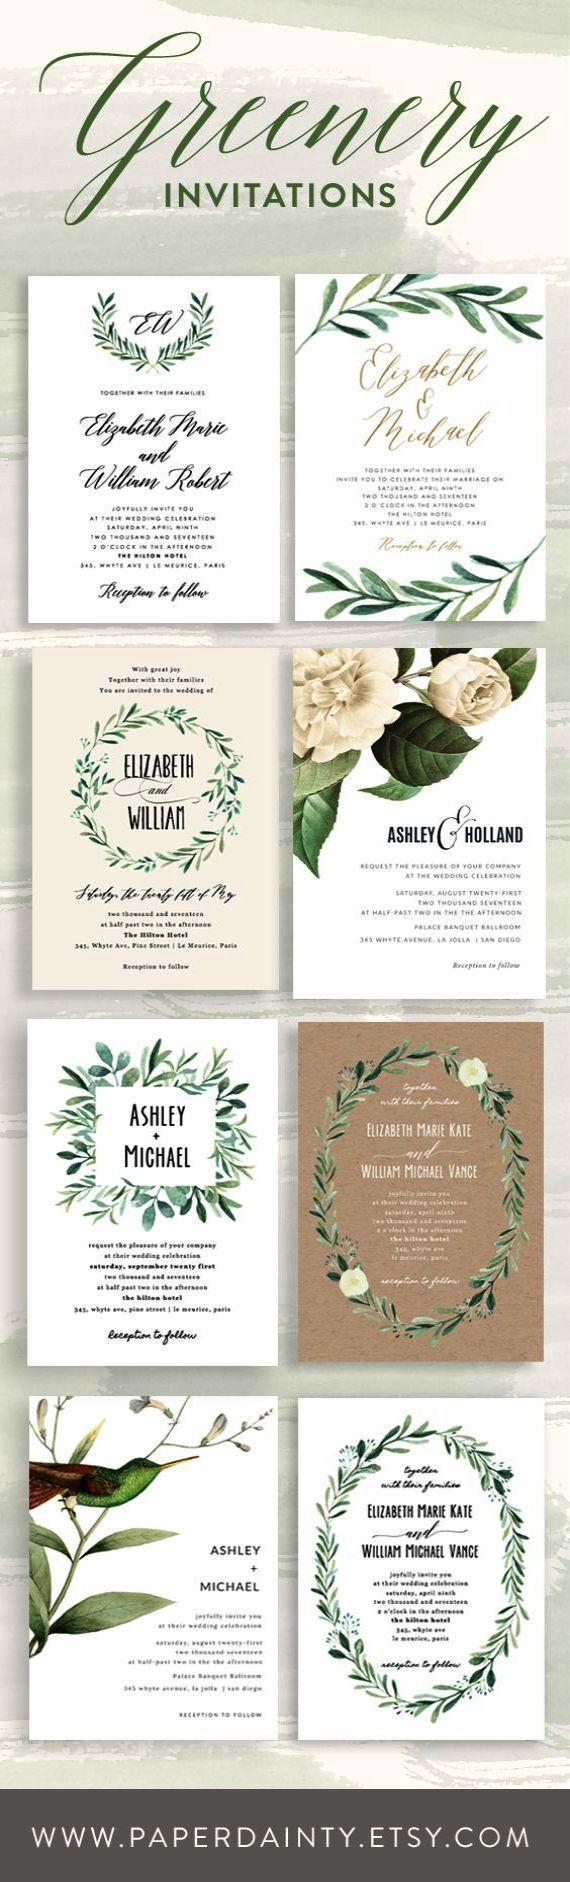 Zulu traditional wedding invitation templates diy wedding